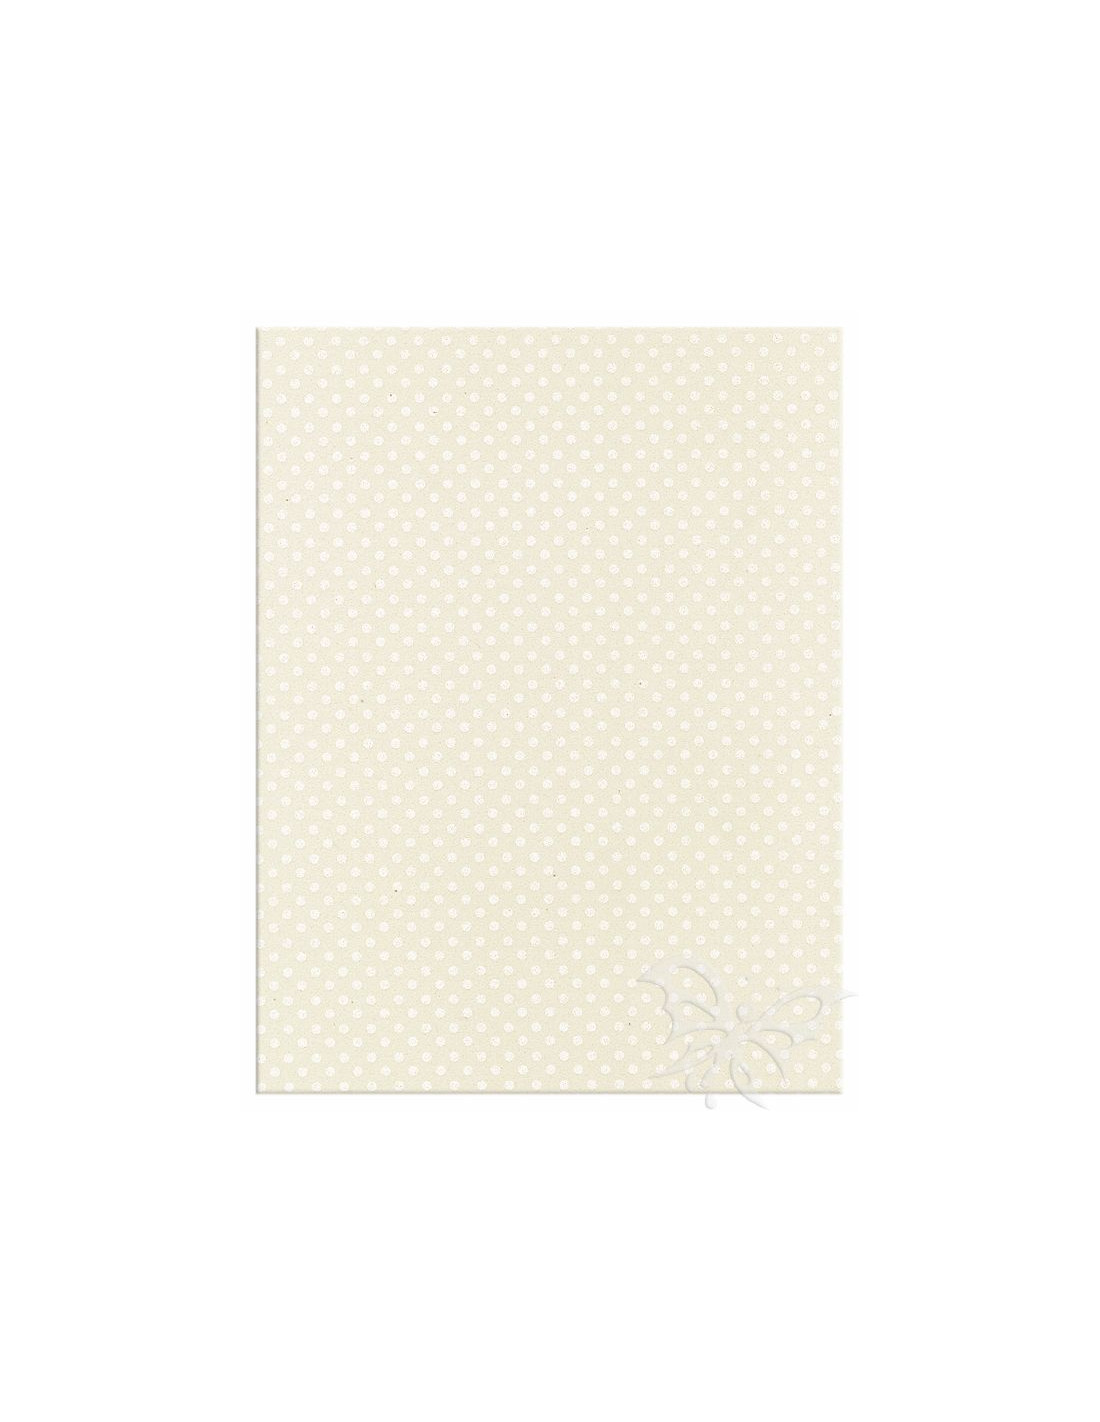 Foglio moosgummi pois panna bianco jpg 800x800 Moosgummi 40x60cm f418cc5ddd3